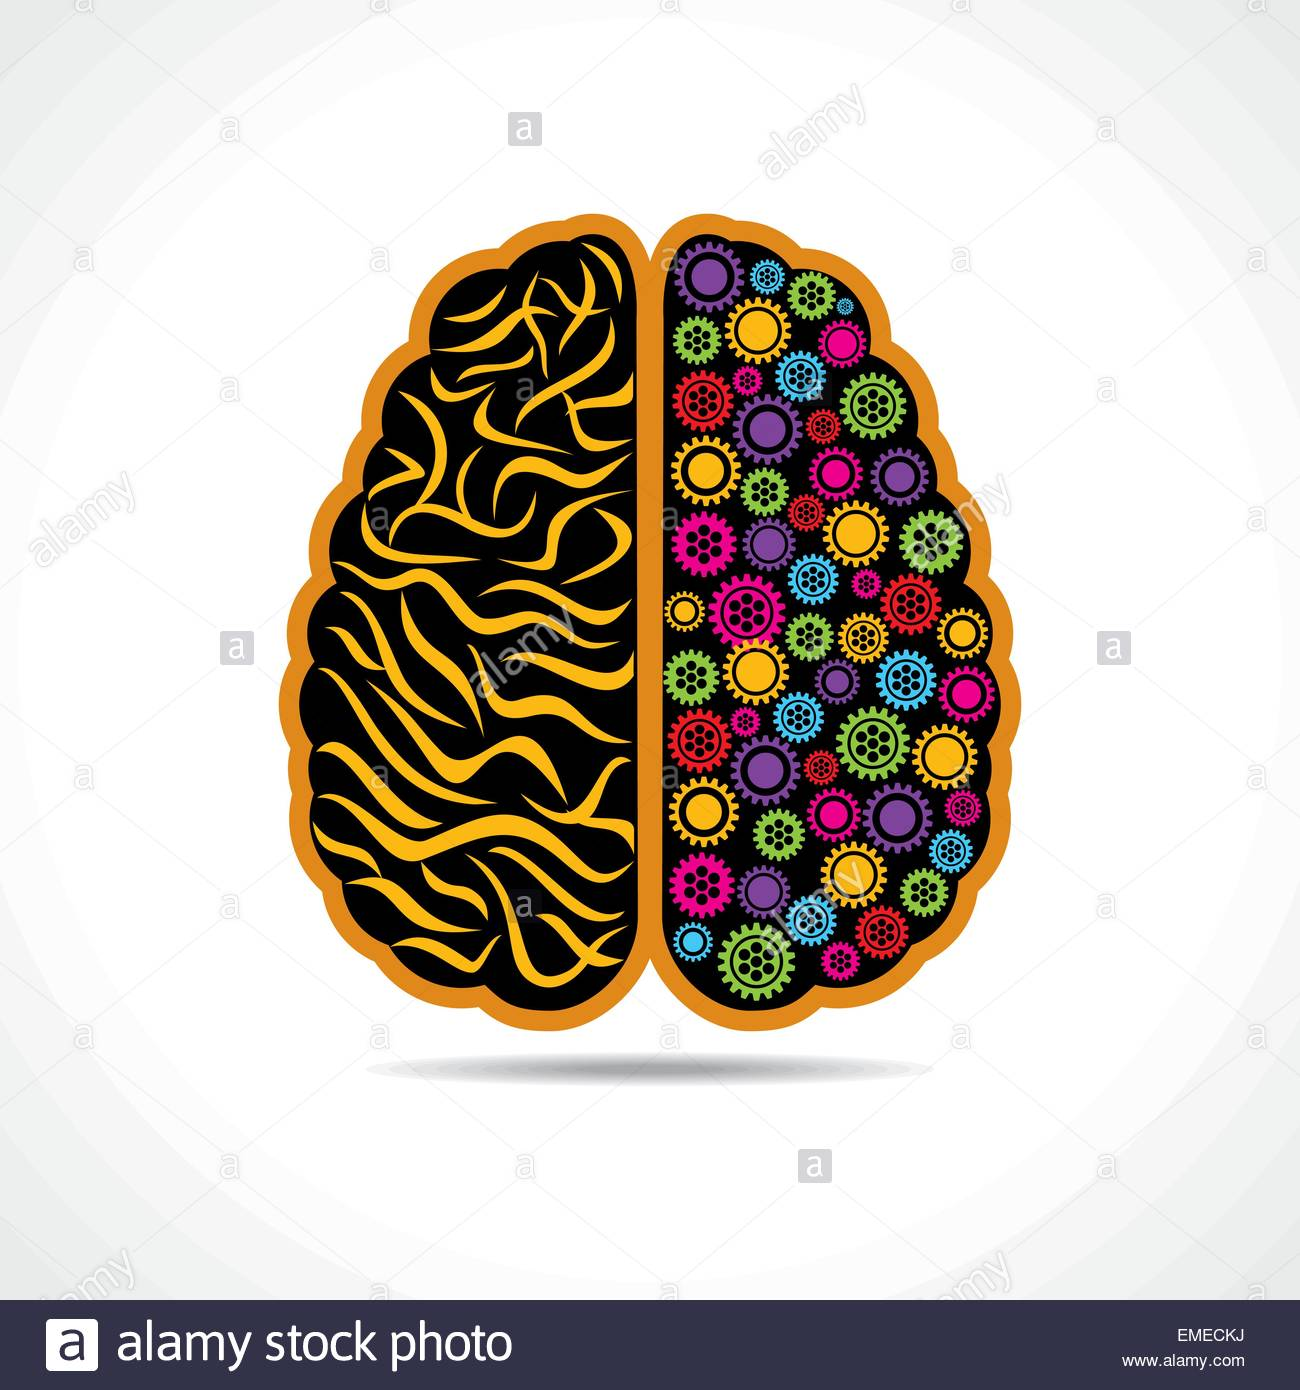 Conceptual idea  silhouette image of brain with gear - Stock Image